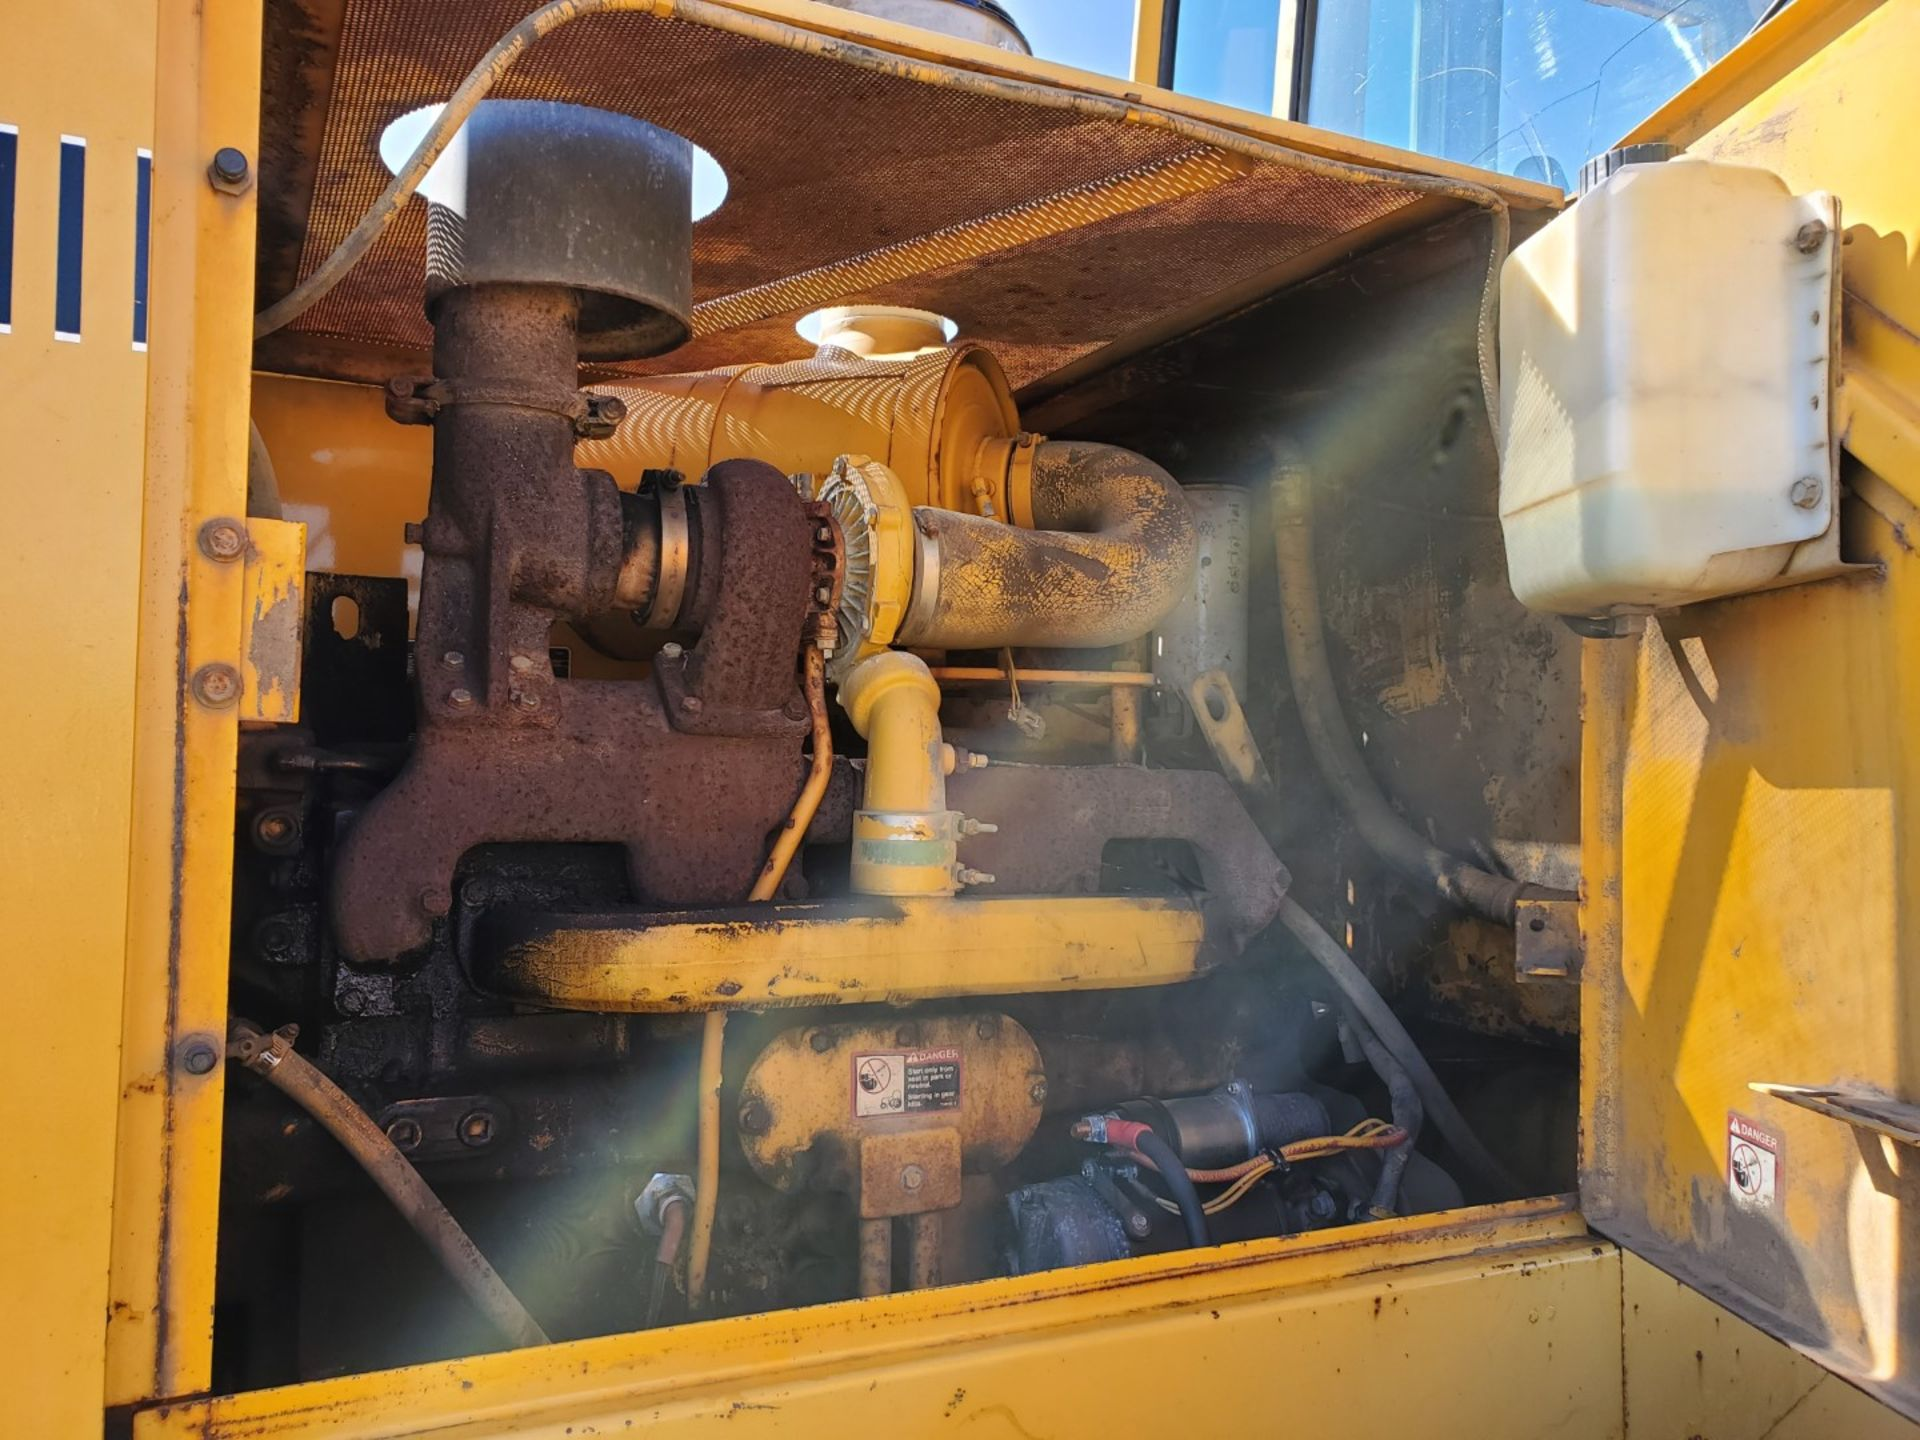 1989 John Deere Loader Model 644E w/ 3.5 CU Yard Bucket, Enclosed Cab, 13,449 Hours, All New Tires - Image 23 of 30